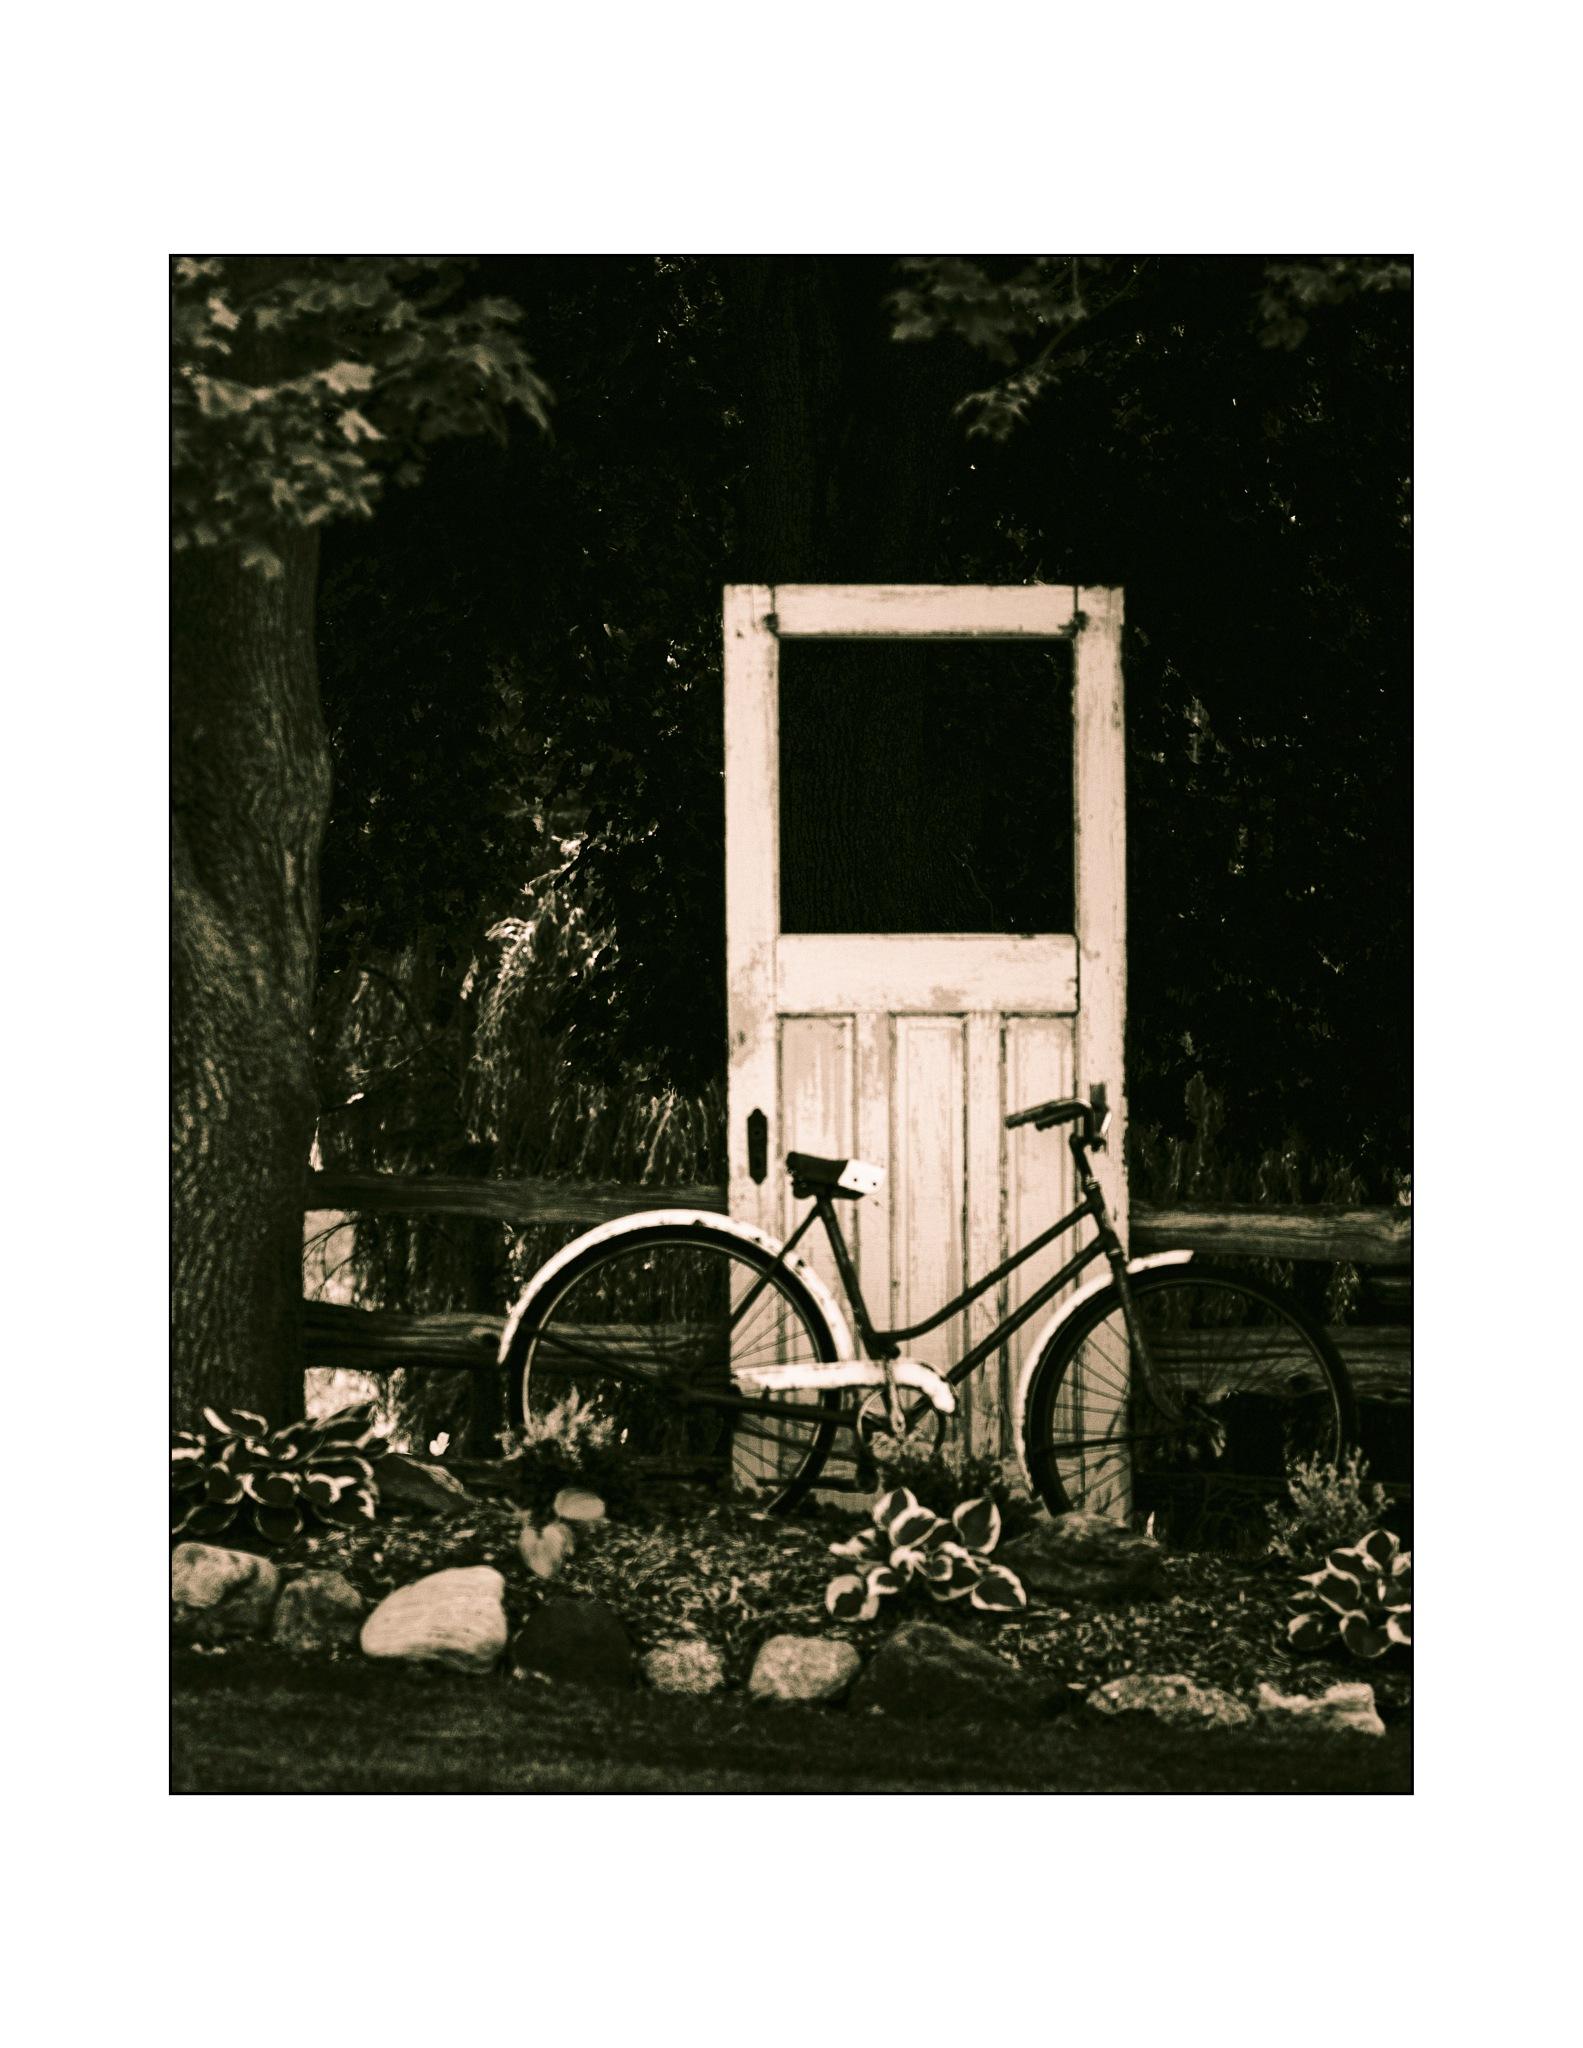 Bicycle & Door by jhulton